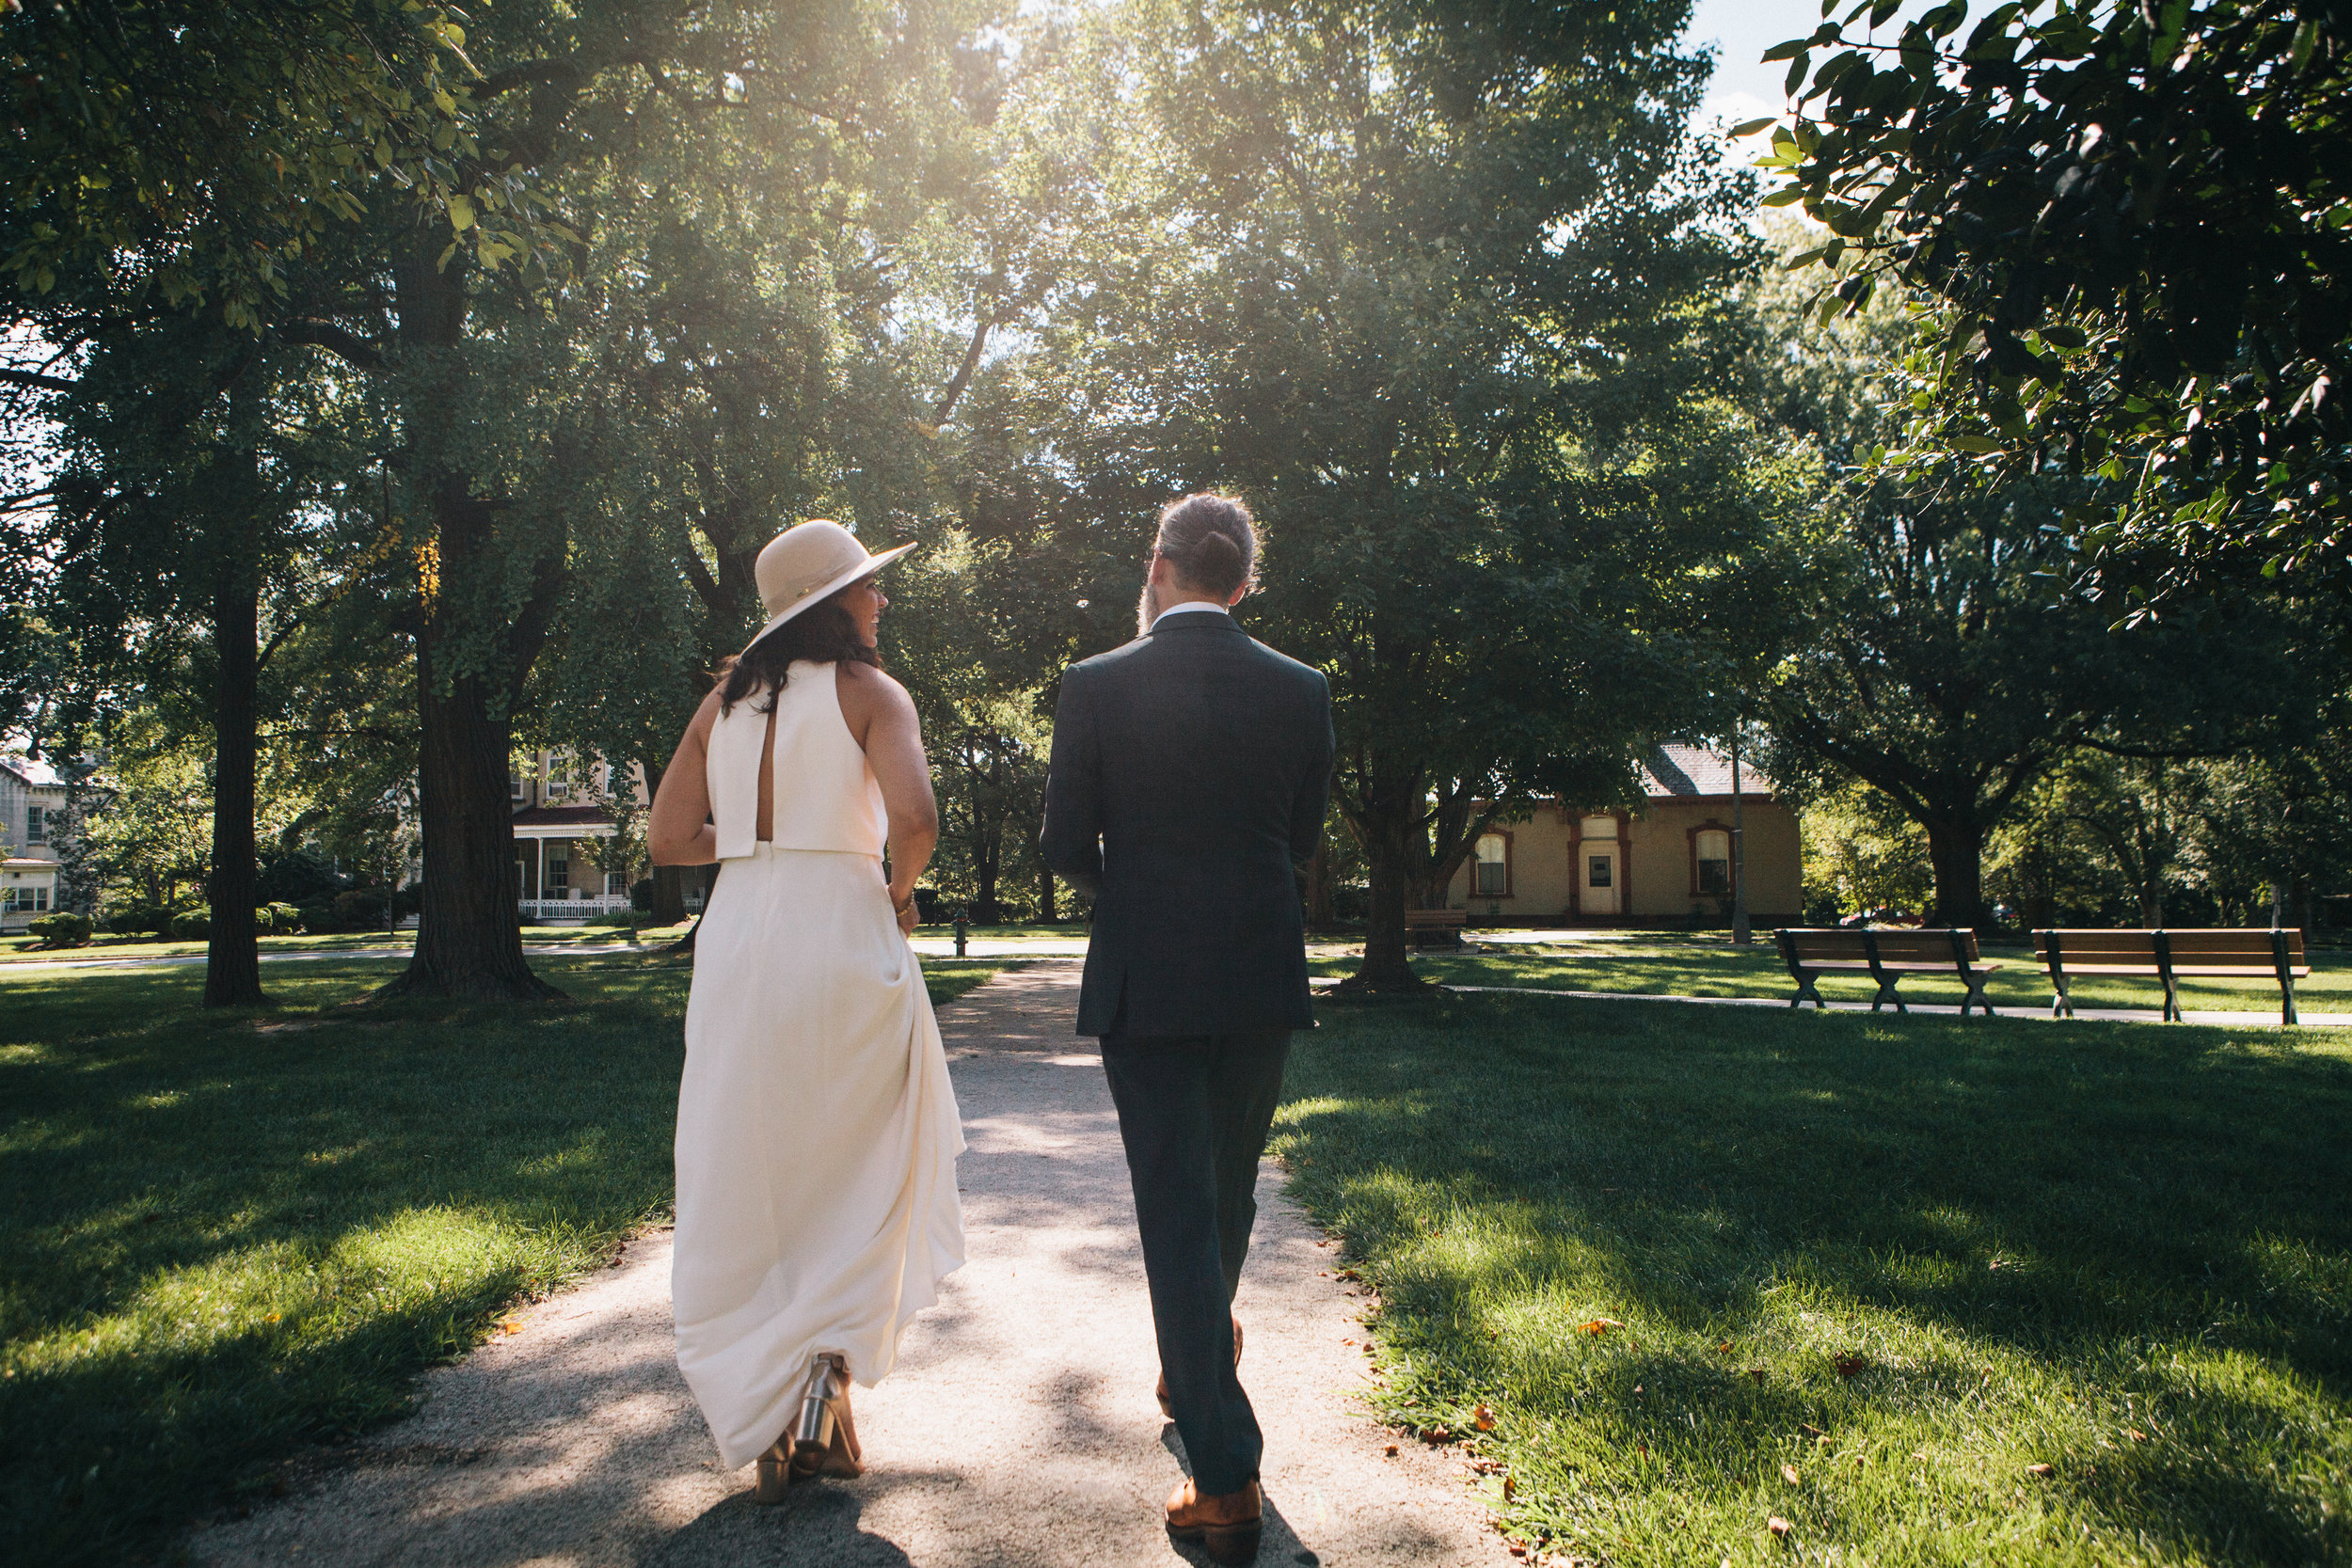 Harlan_LeeHart_Wedding-52.jpg